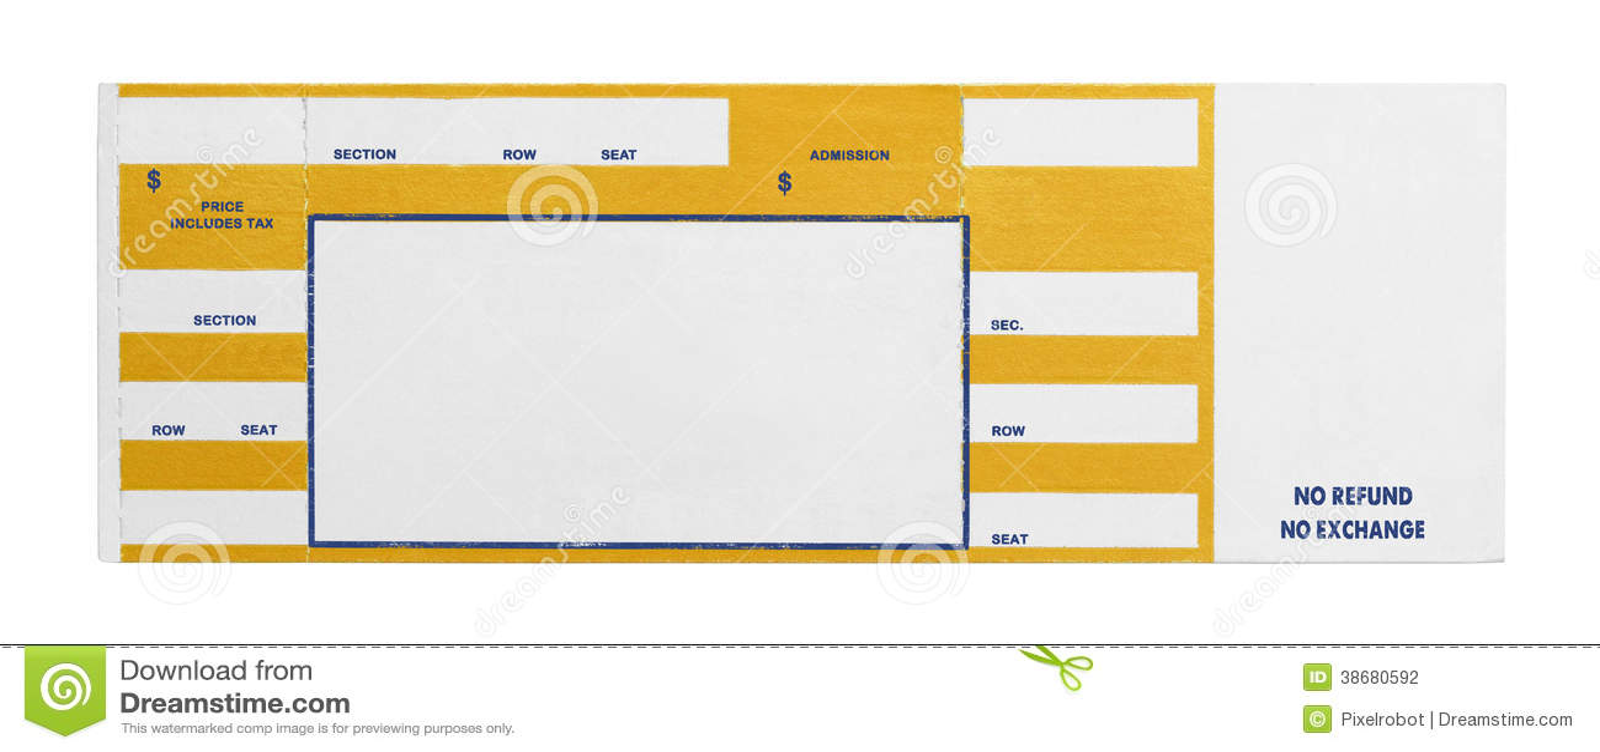 Awesome Druckbare Blank Tickets Embellishment - FORTSETZUNG ...